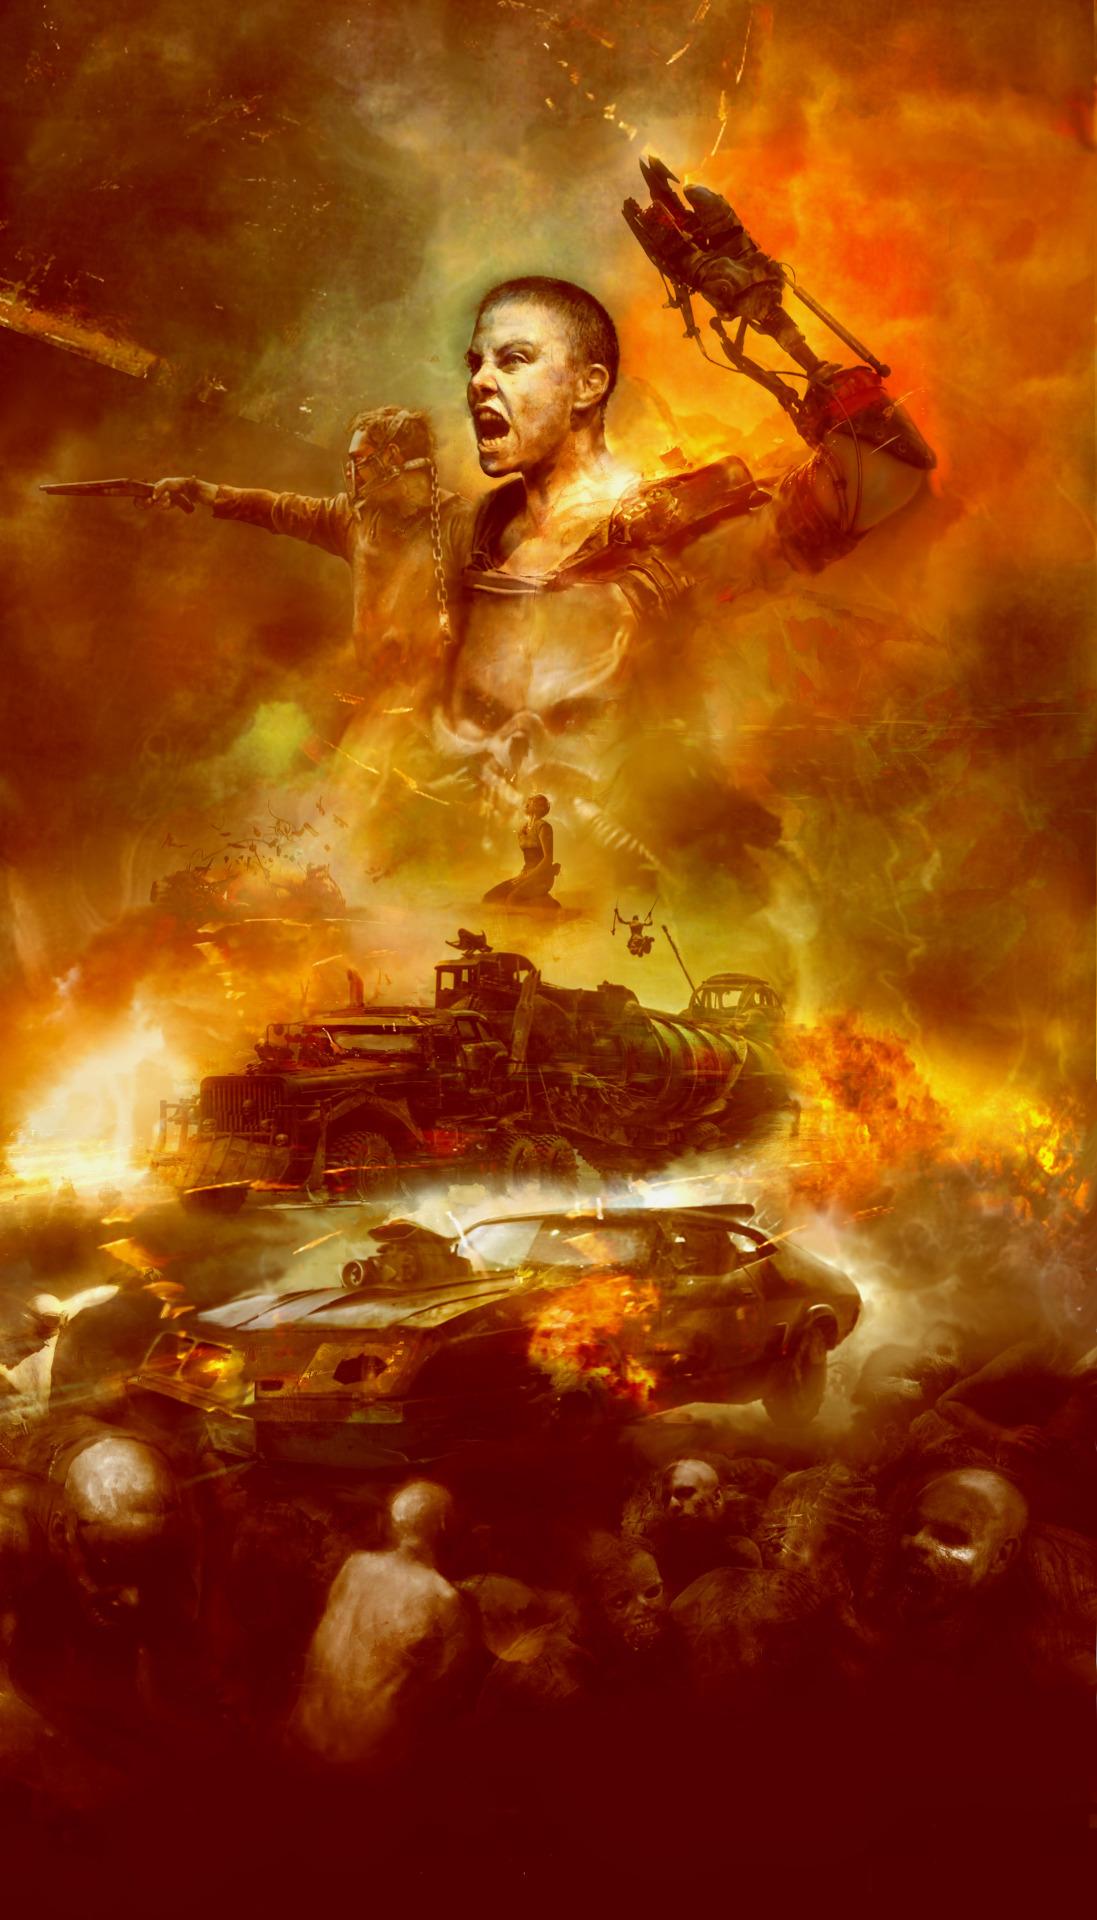 tumblr o0h11biMe91tl926yo1 1280 1 Mad Max: Fury Road Mad Max: Fury Road illustration Art